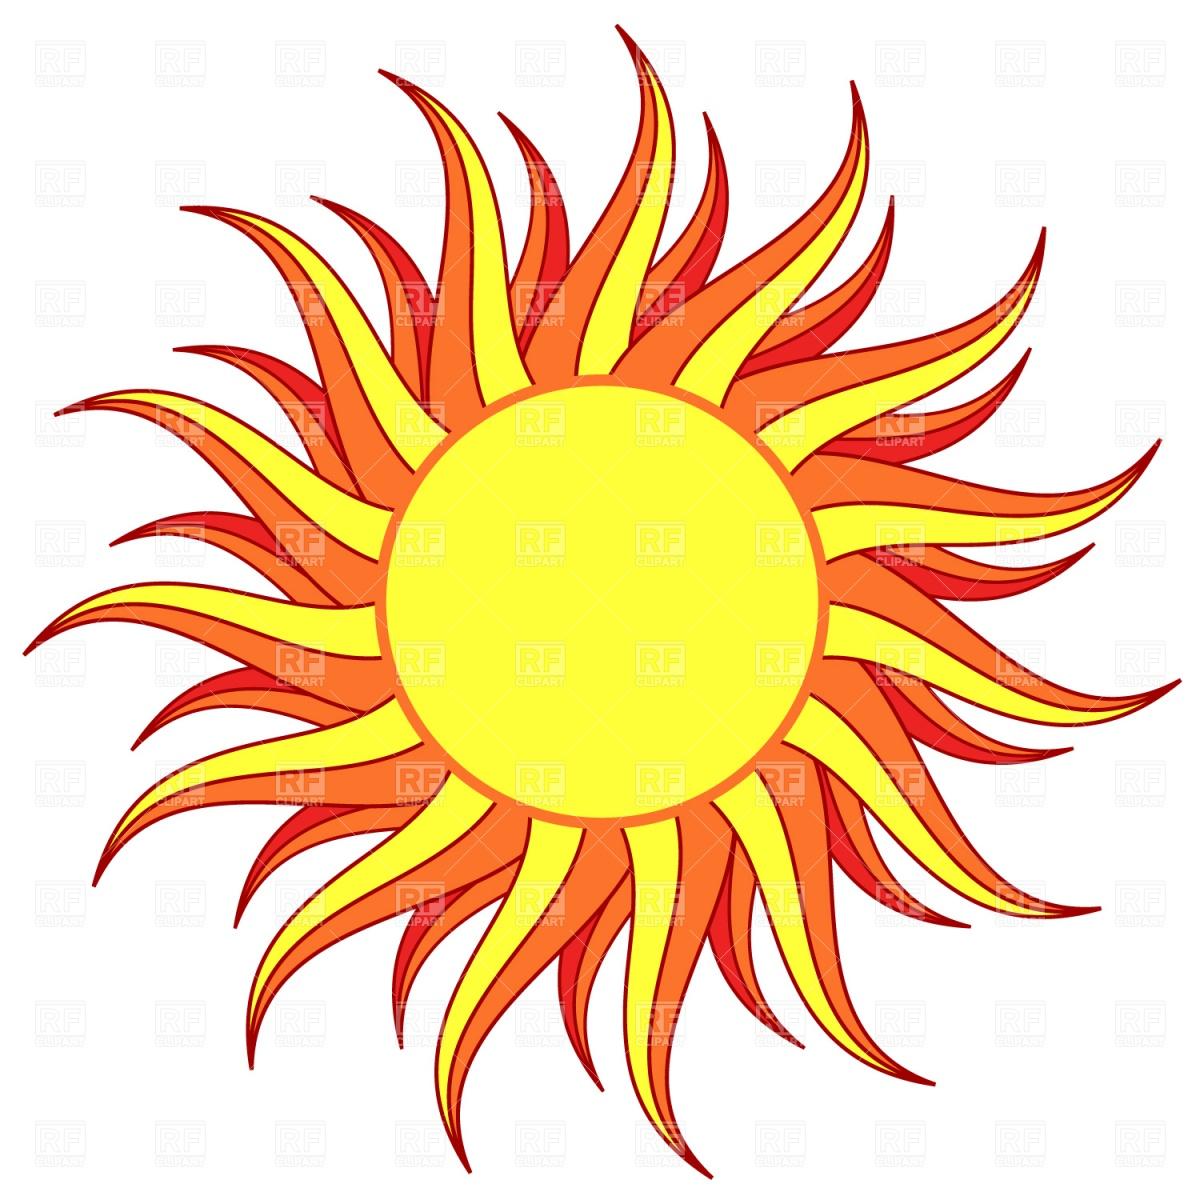 sun silhouette clipart clipart suggest sun ray vector free download sun ray vector free download